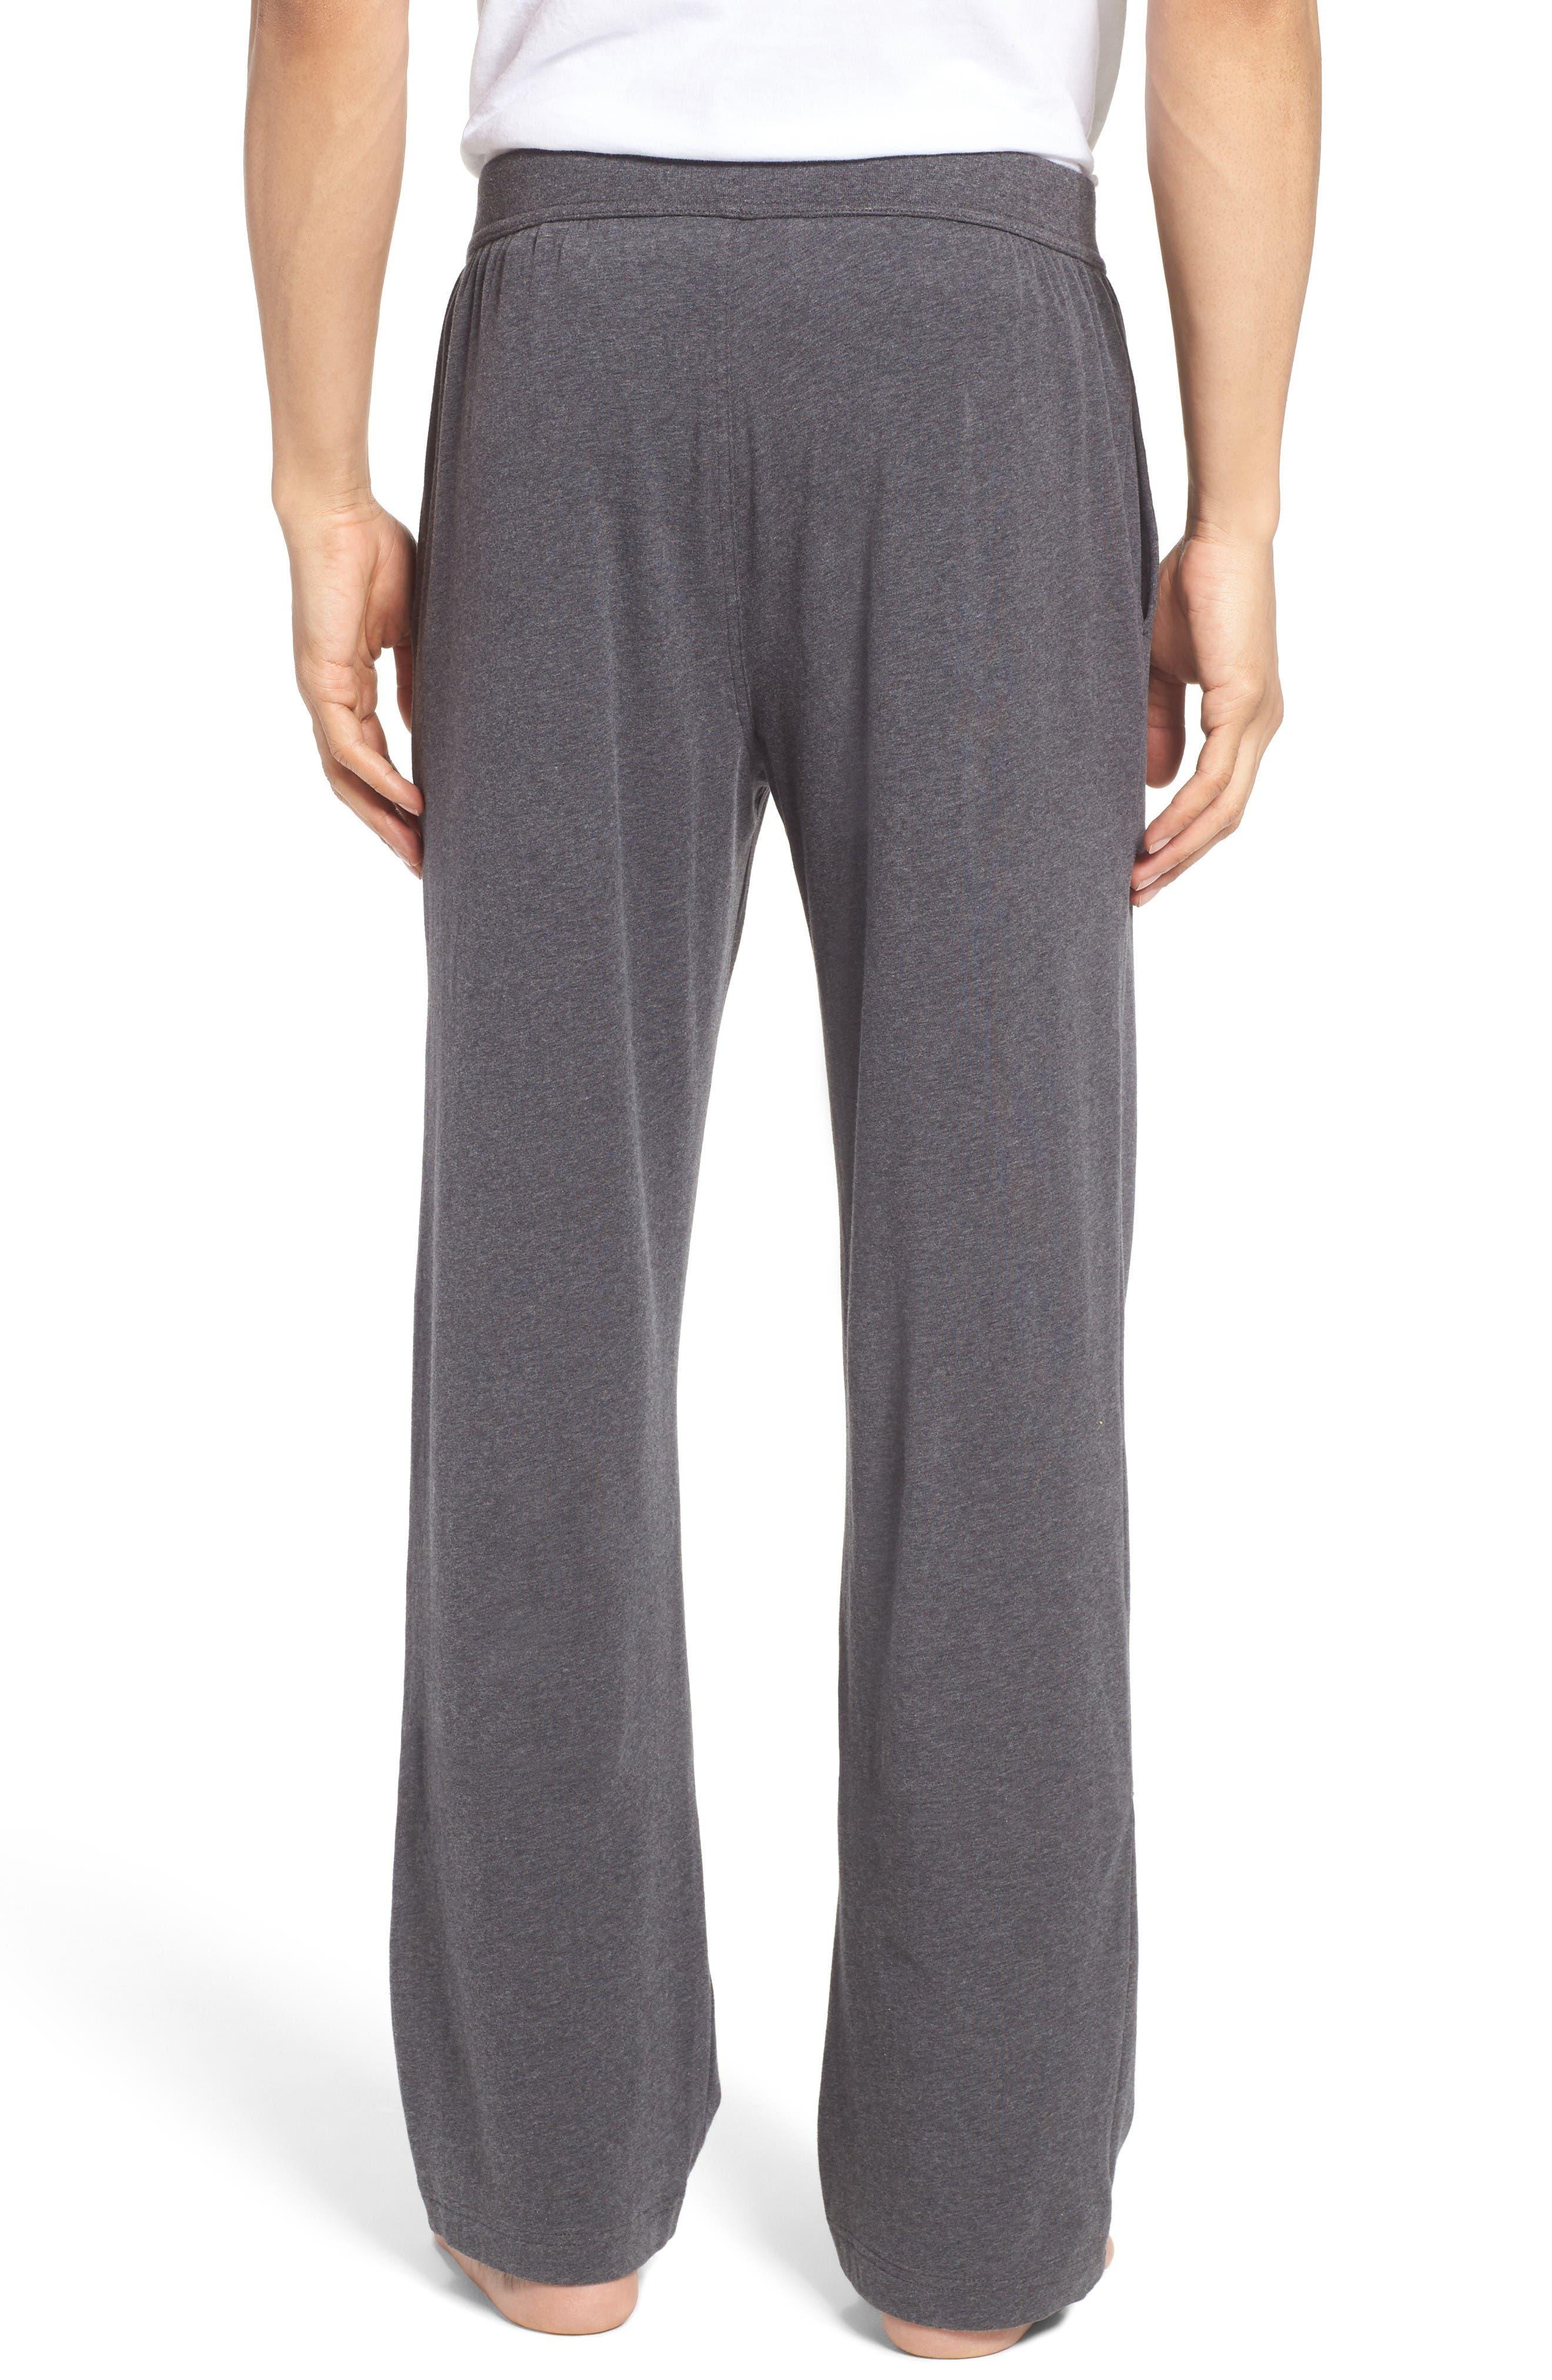 Stretch Cotton Lounge Pants,                             Alternate thumbnail 2, color,                             Grey Charcoal